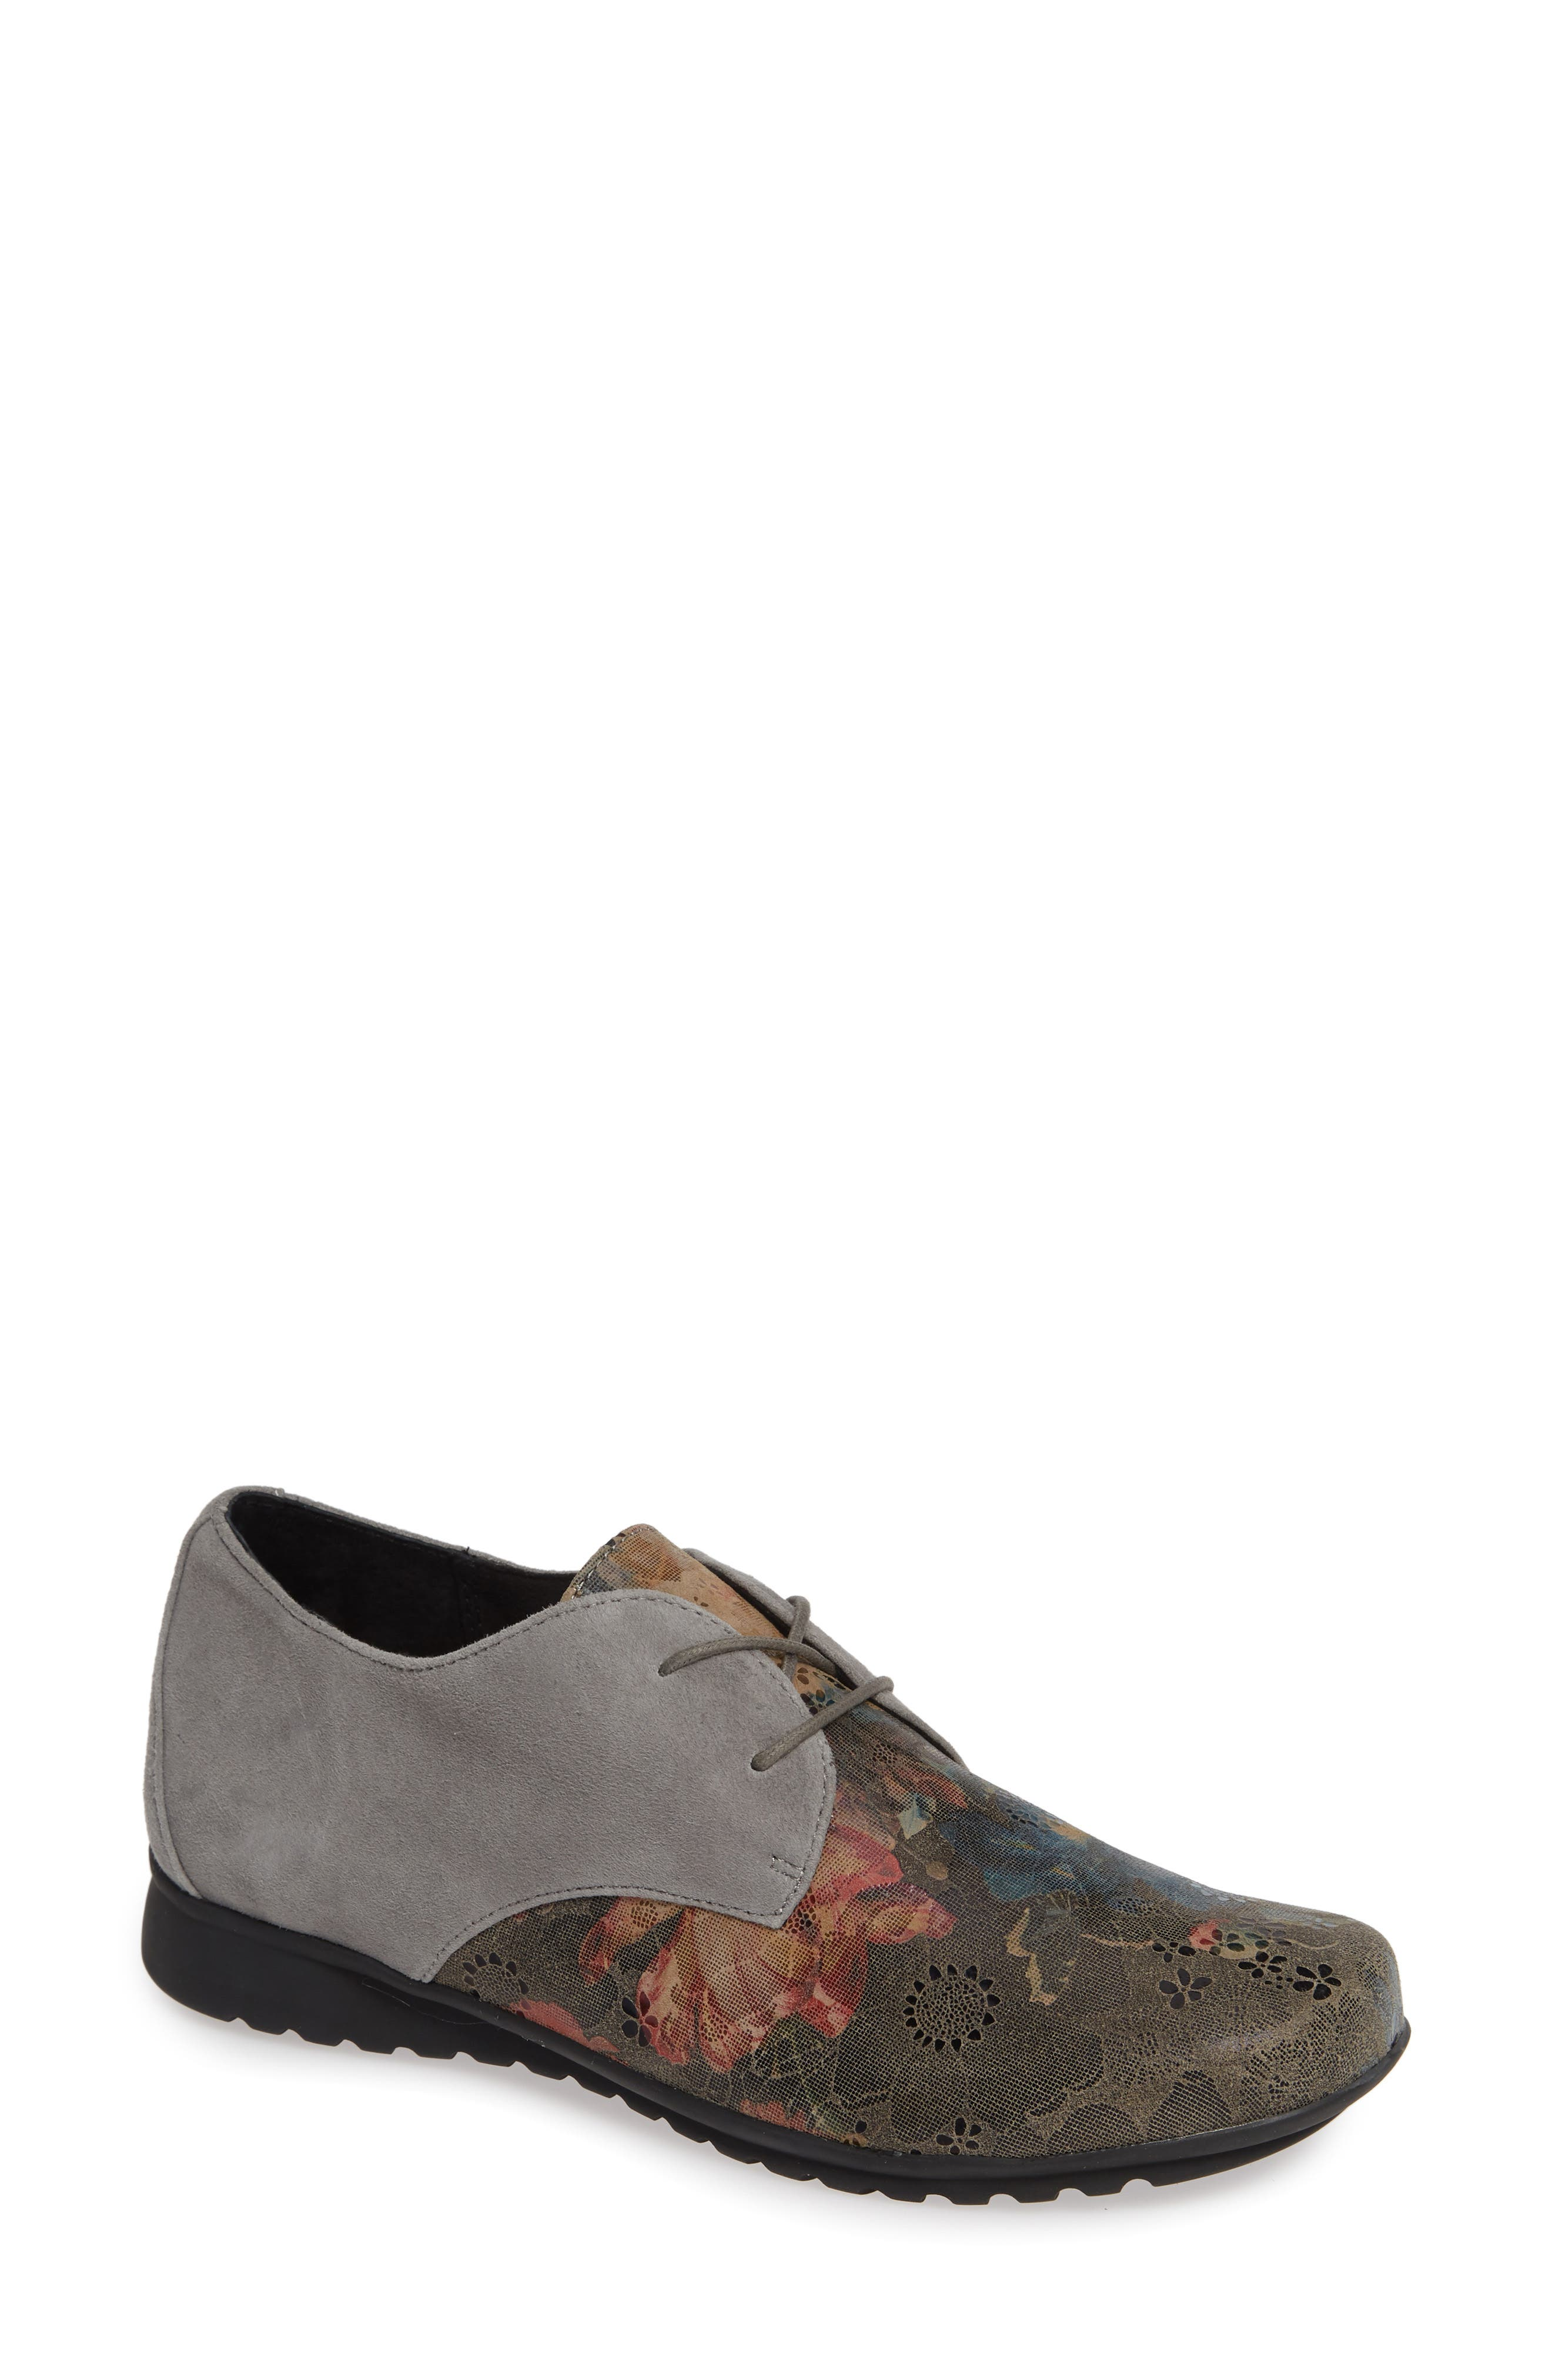 AETREX Erin Saddle Shoe, Main, color, CHARCOAL LEATHER